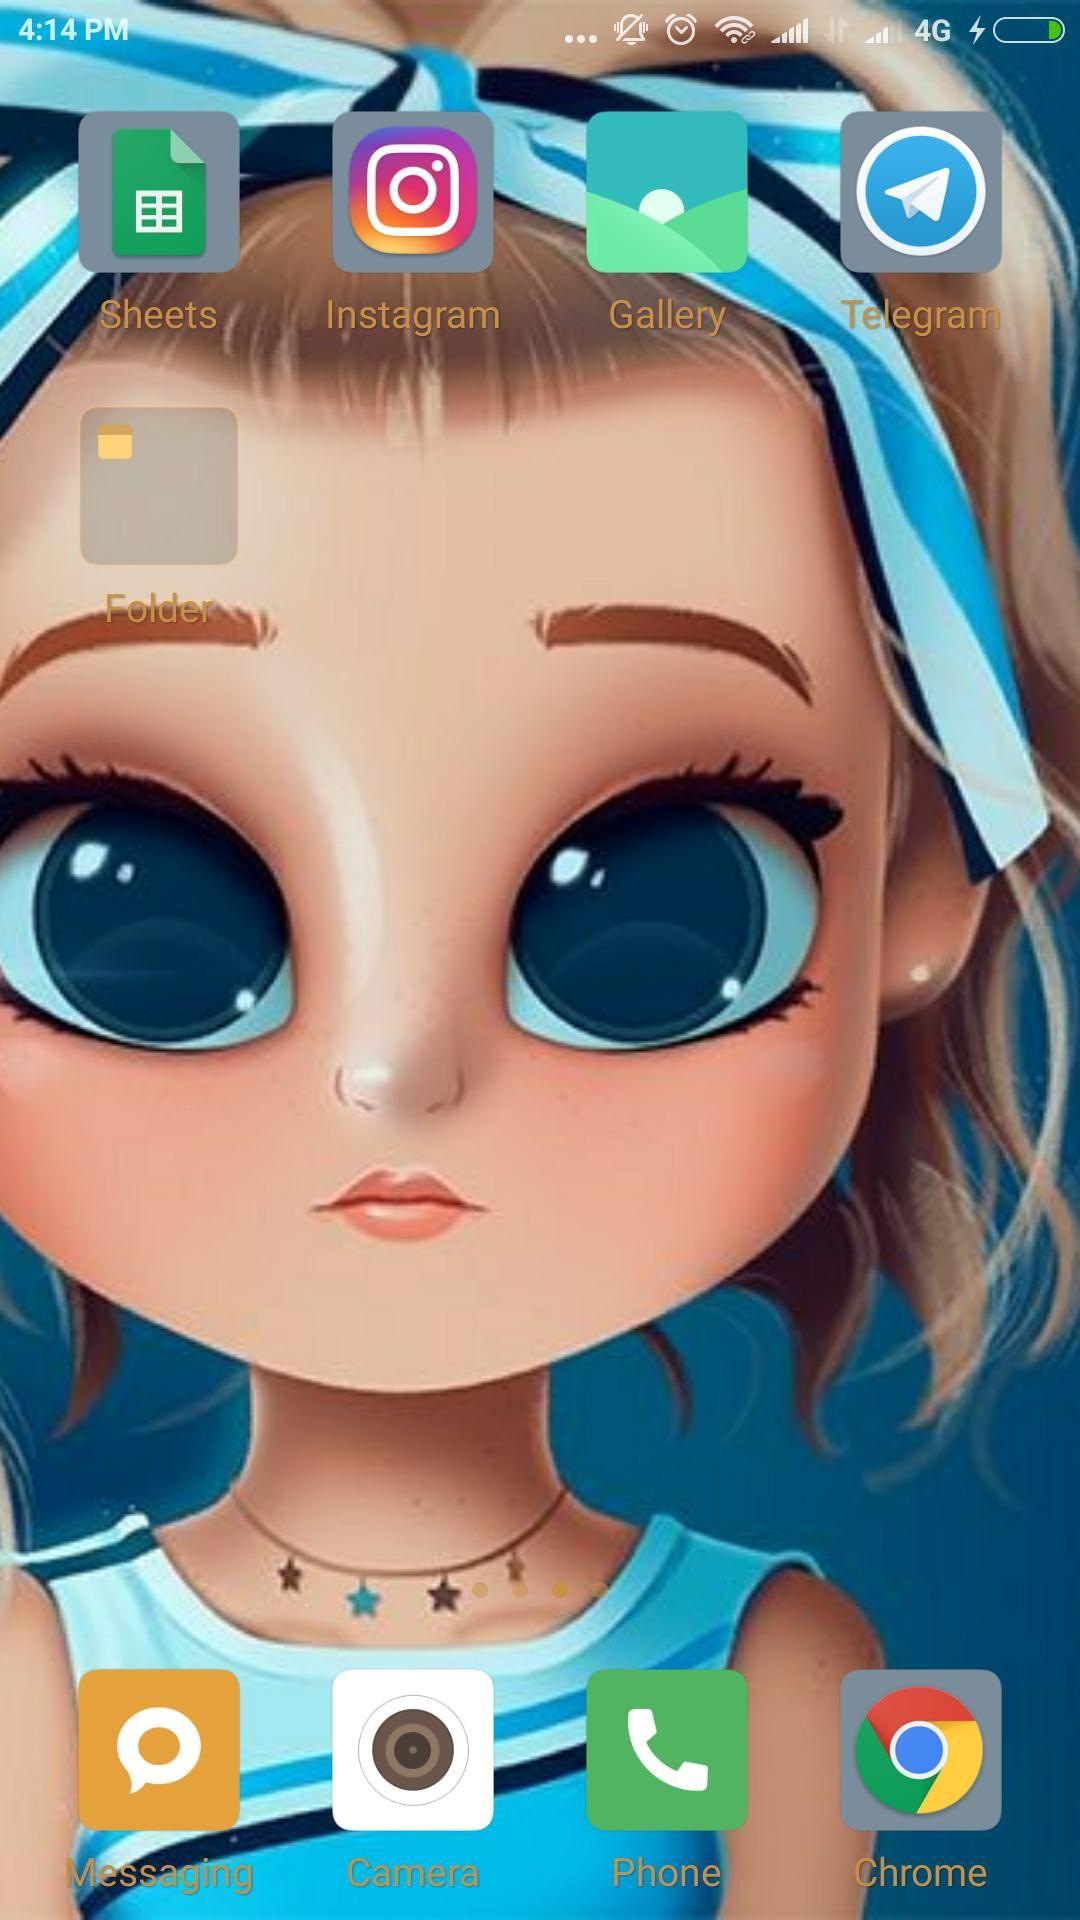 Cute Cartoon Wallpaper For Android Cute Cartoon Wallpapers Cartoon Wallpaper Android Wallpaper